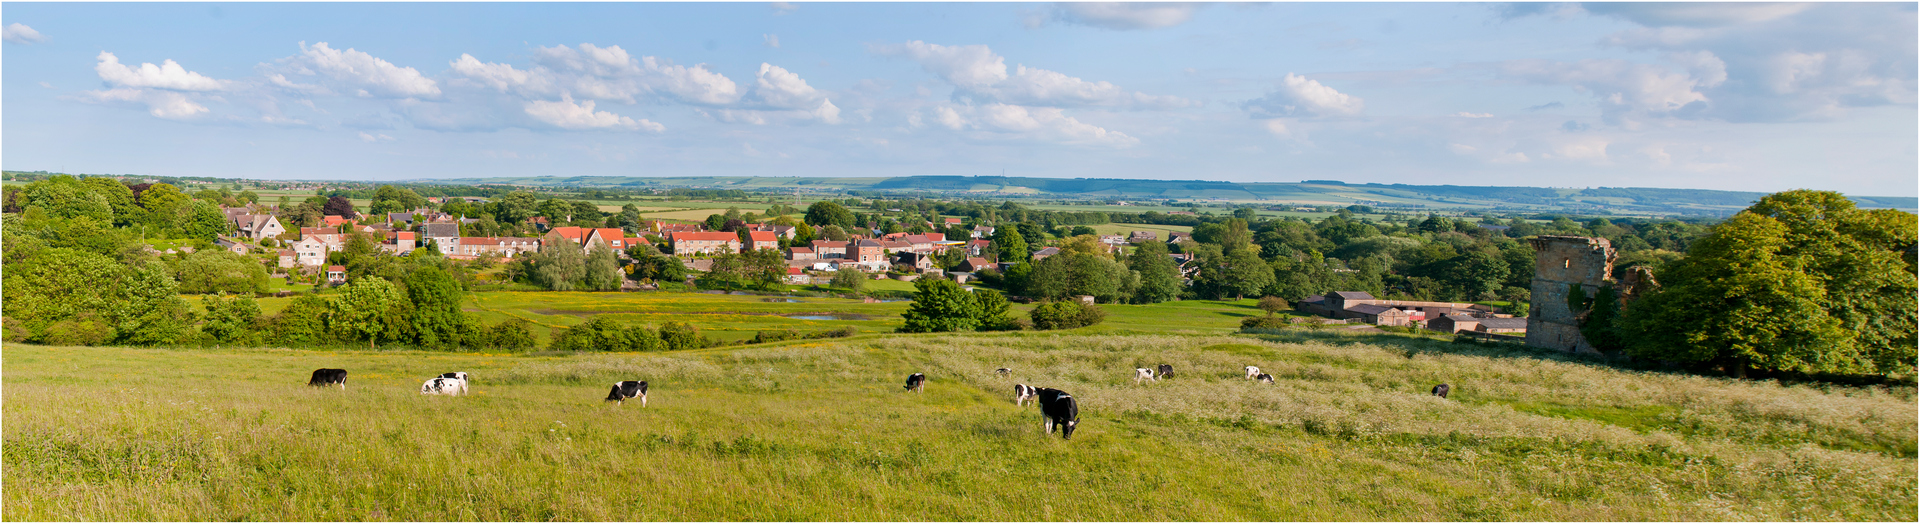 East Ayton North Yorkshire - Barry Spindler